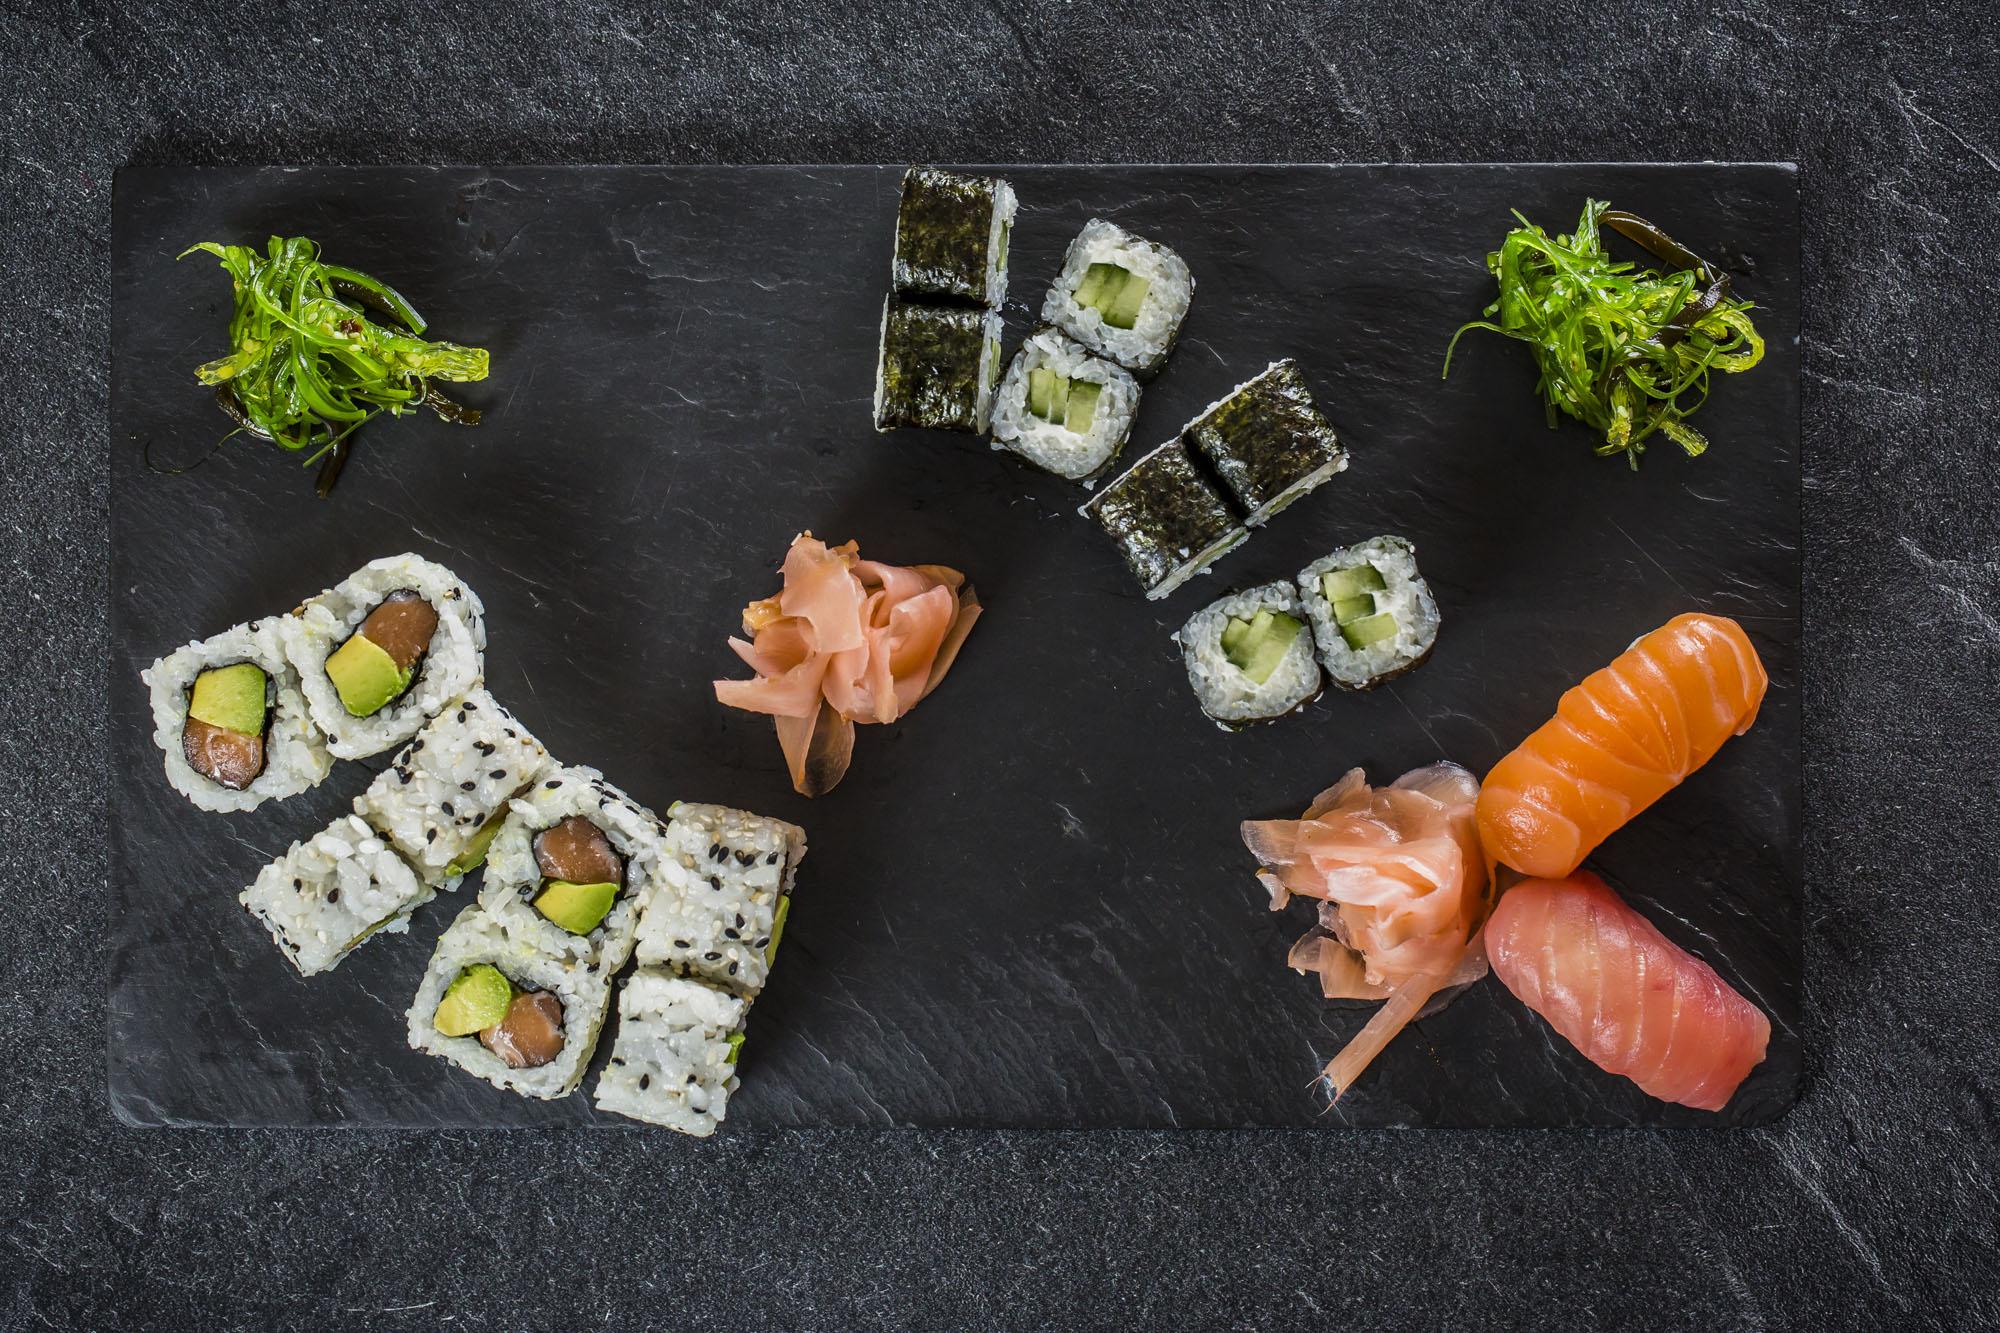 Plateau Le Classique Ô Sushi Bar california avocat saumon